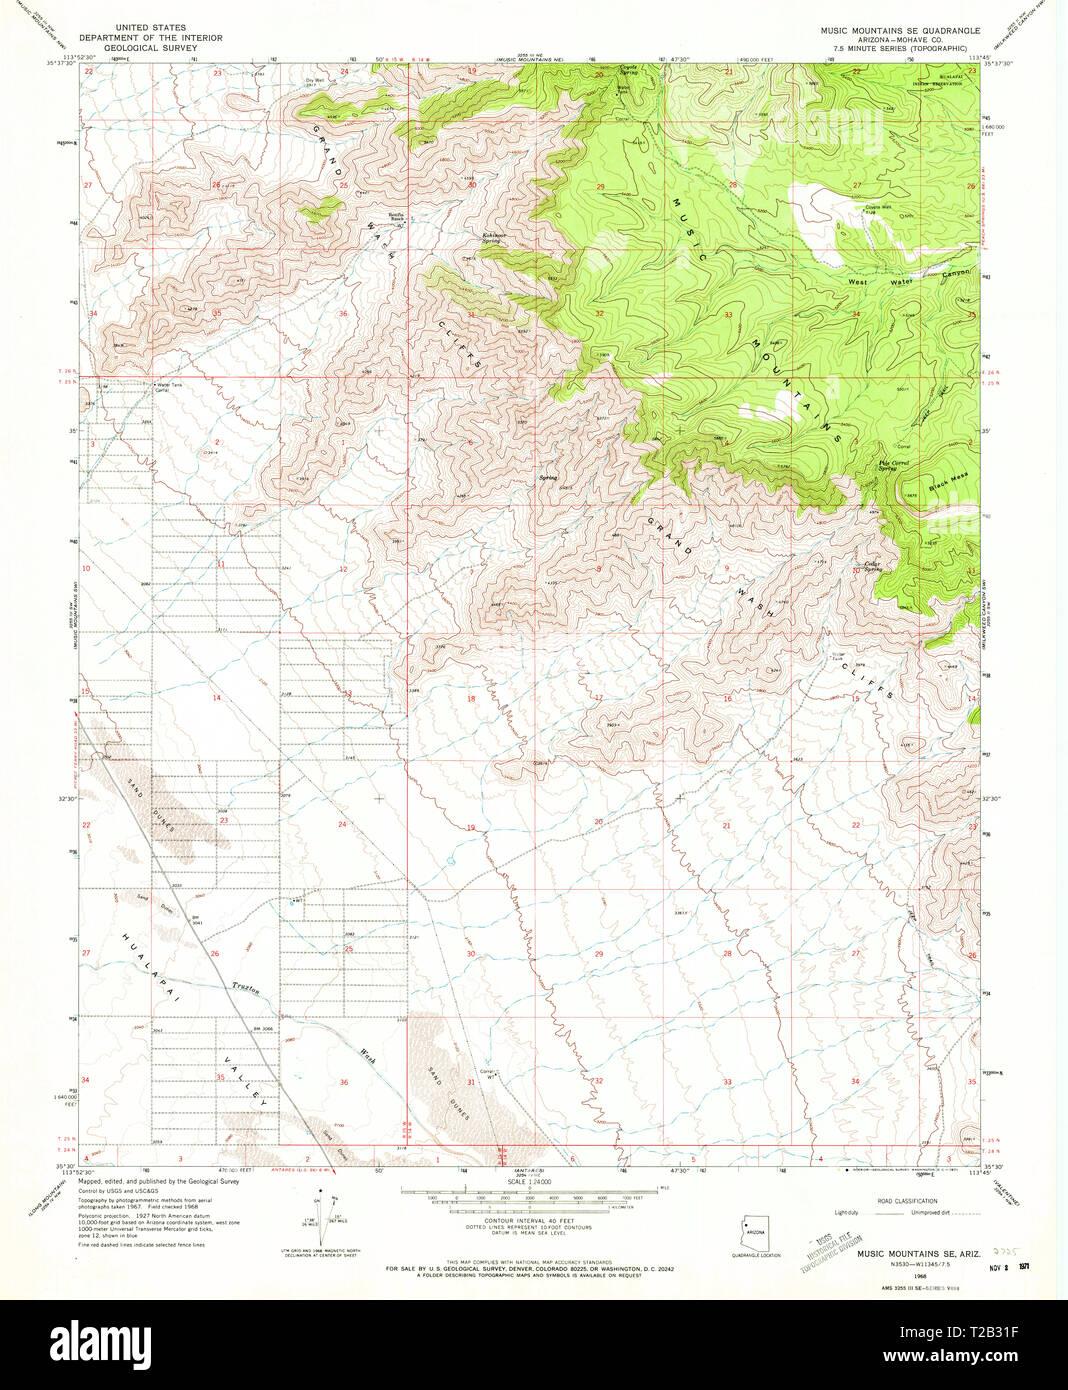 USGS TOPO Map Arizona AZ Music Mountains SE 312567 1968 ... Map Of Arizona Mountains on map of white mountain area, map of laughlin casinos, map idaho mountains, arizona major mountains, map of az, map california mountains, location of superstition mountains, new mexico map with mountains, map utah mountains, map of nevada,